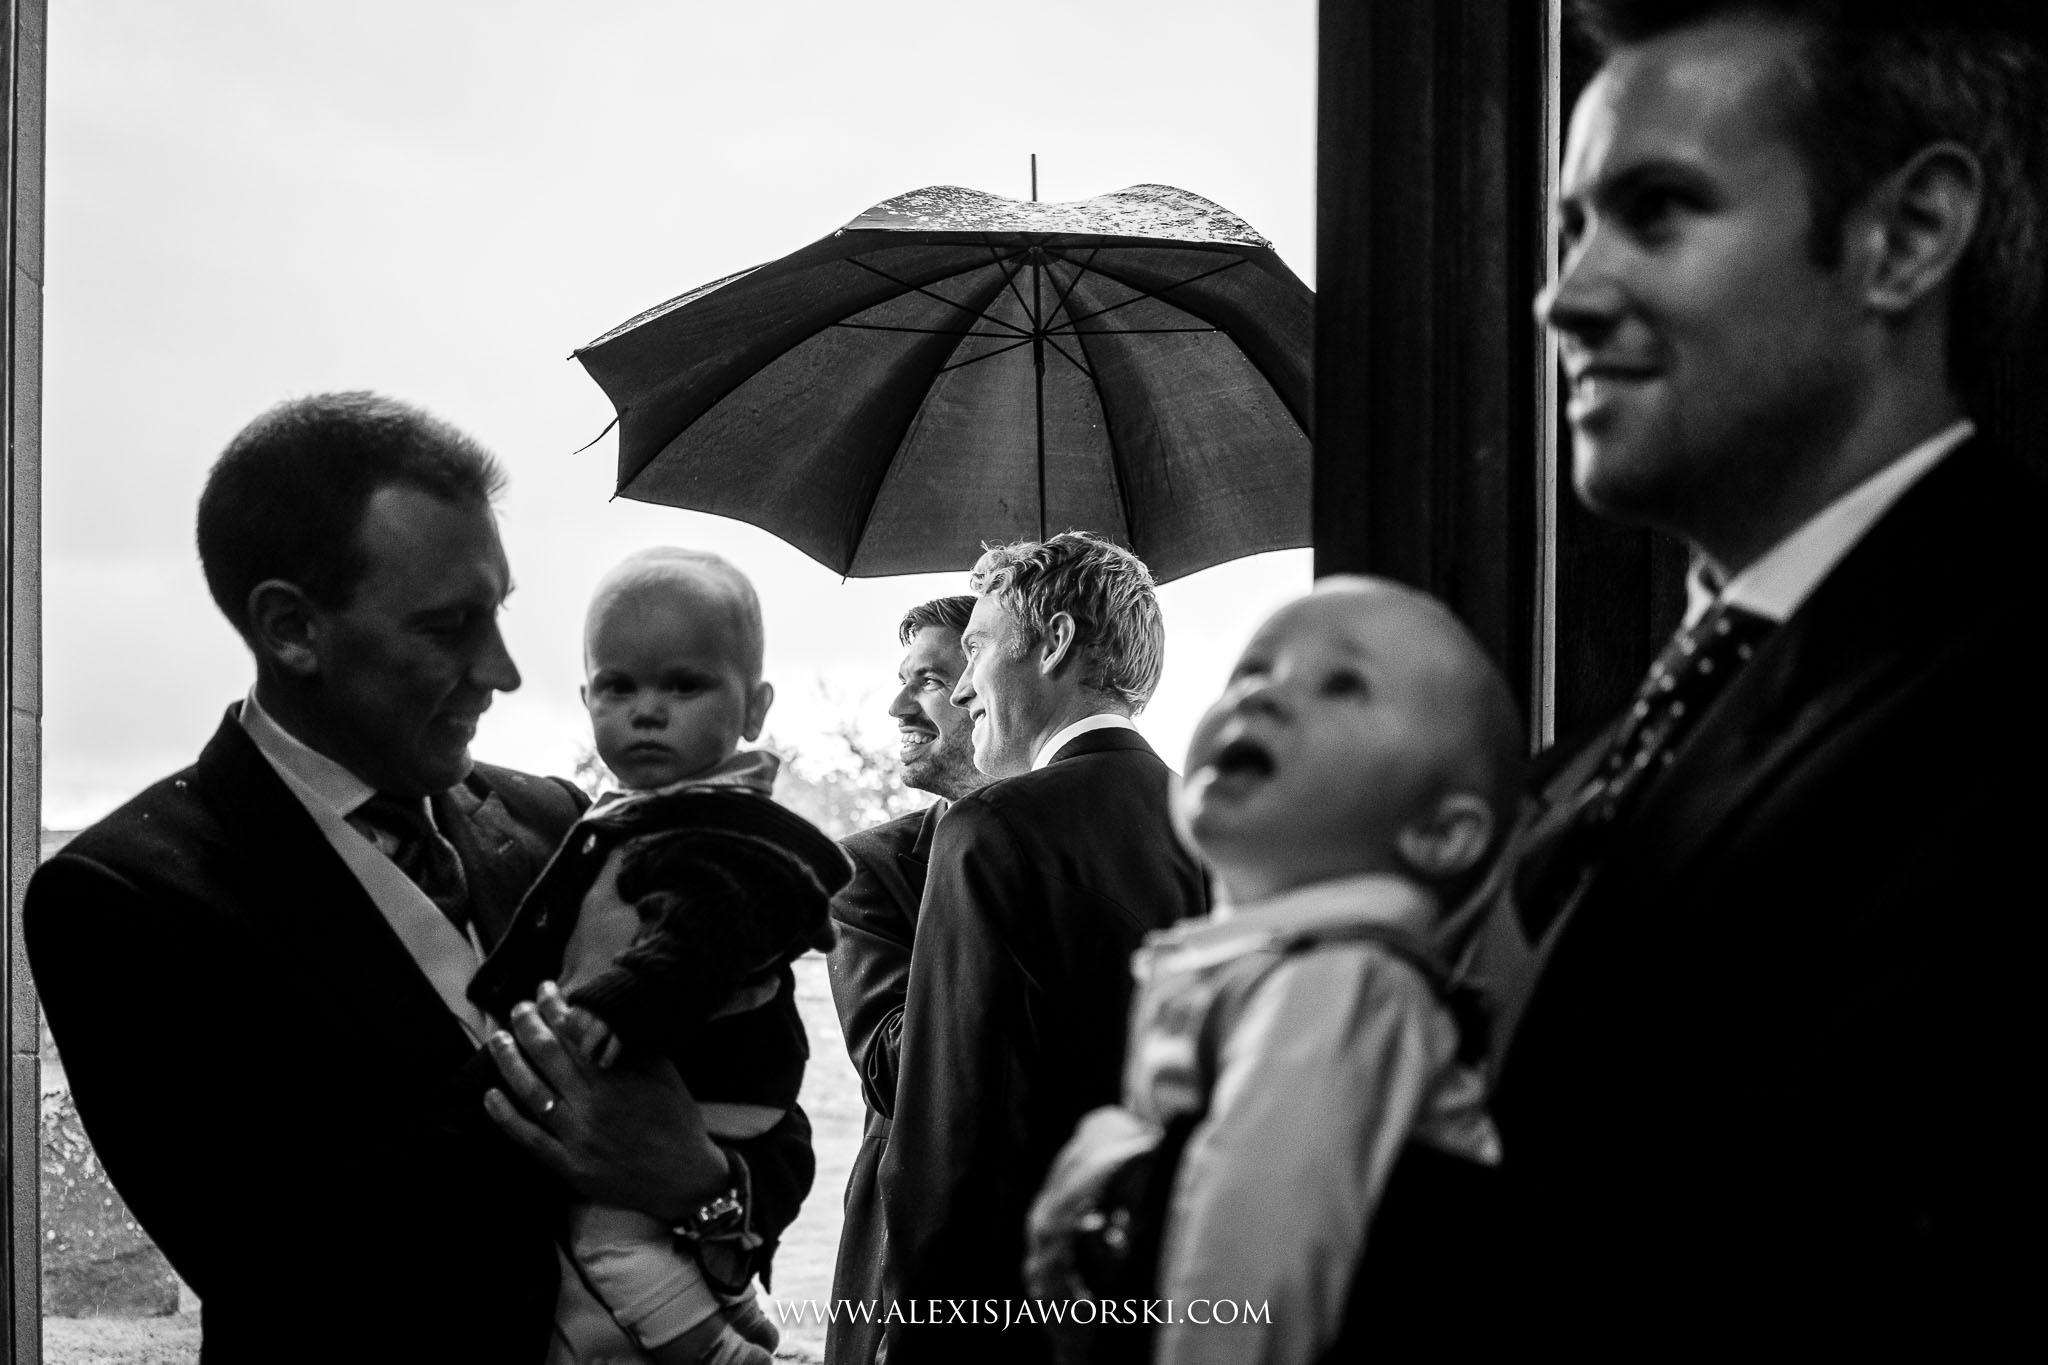 kids by the front door of church